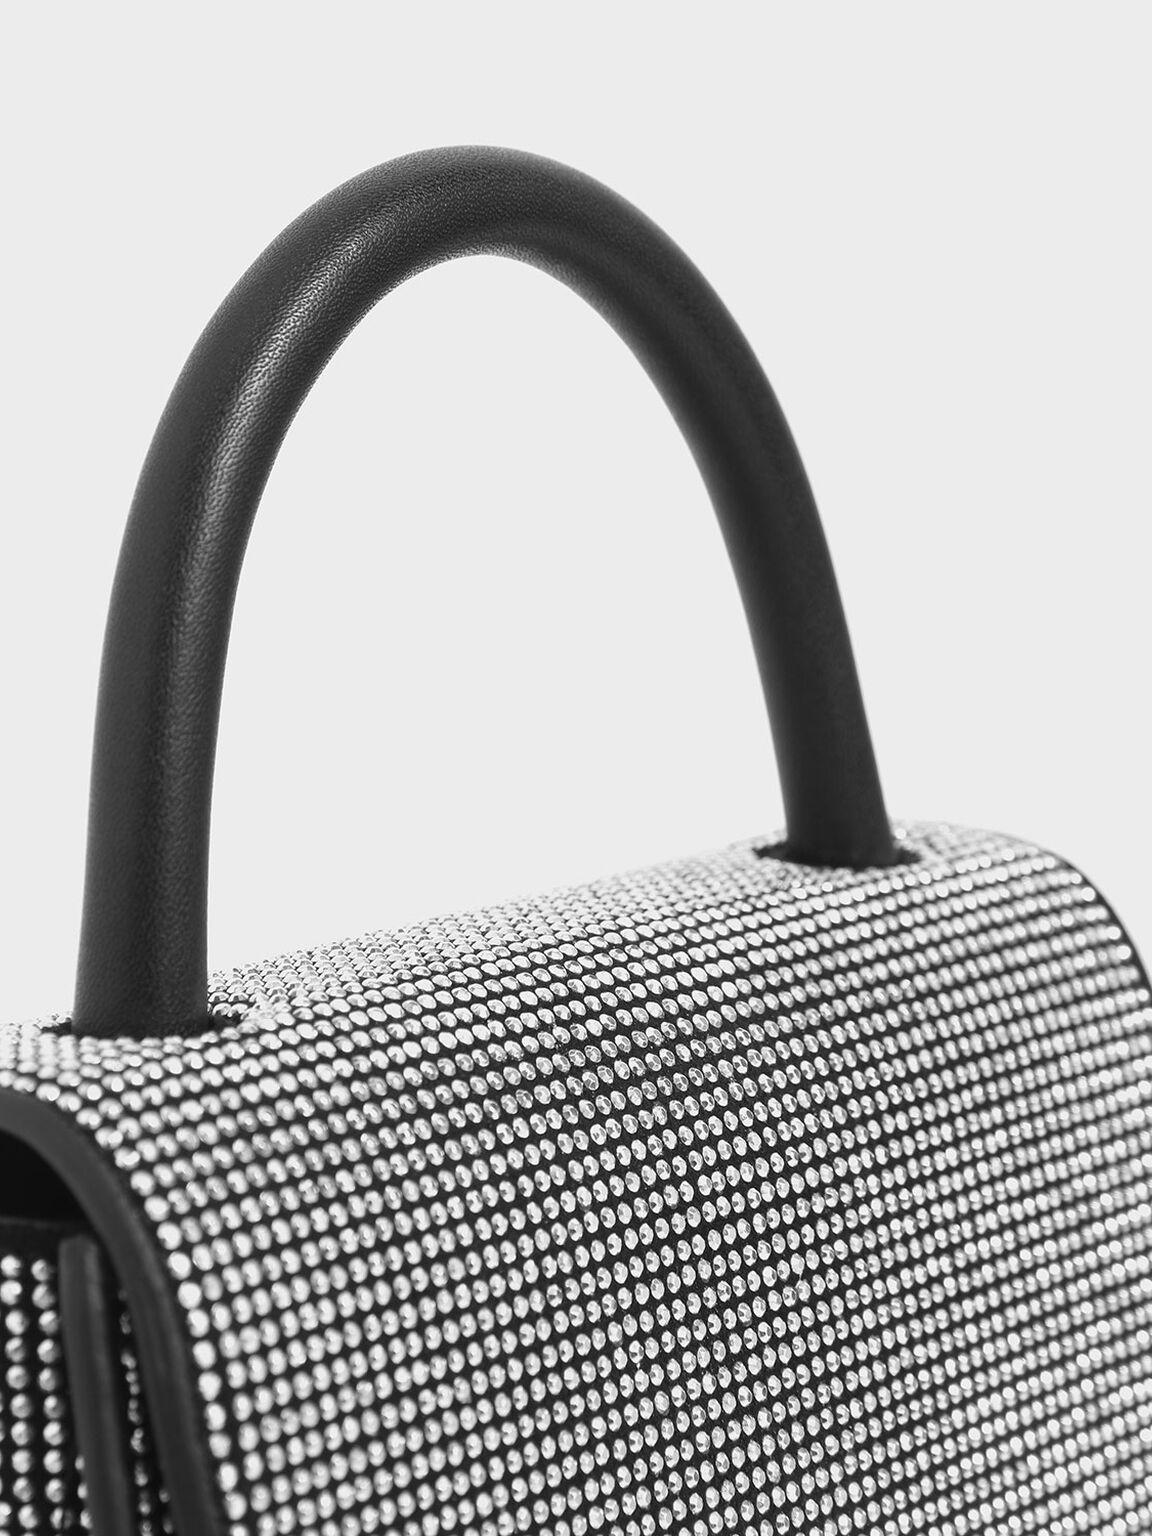 Microsuede Embellished Mini Top Handle Bag, Black, hi-res